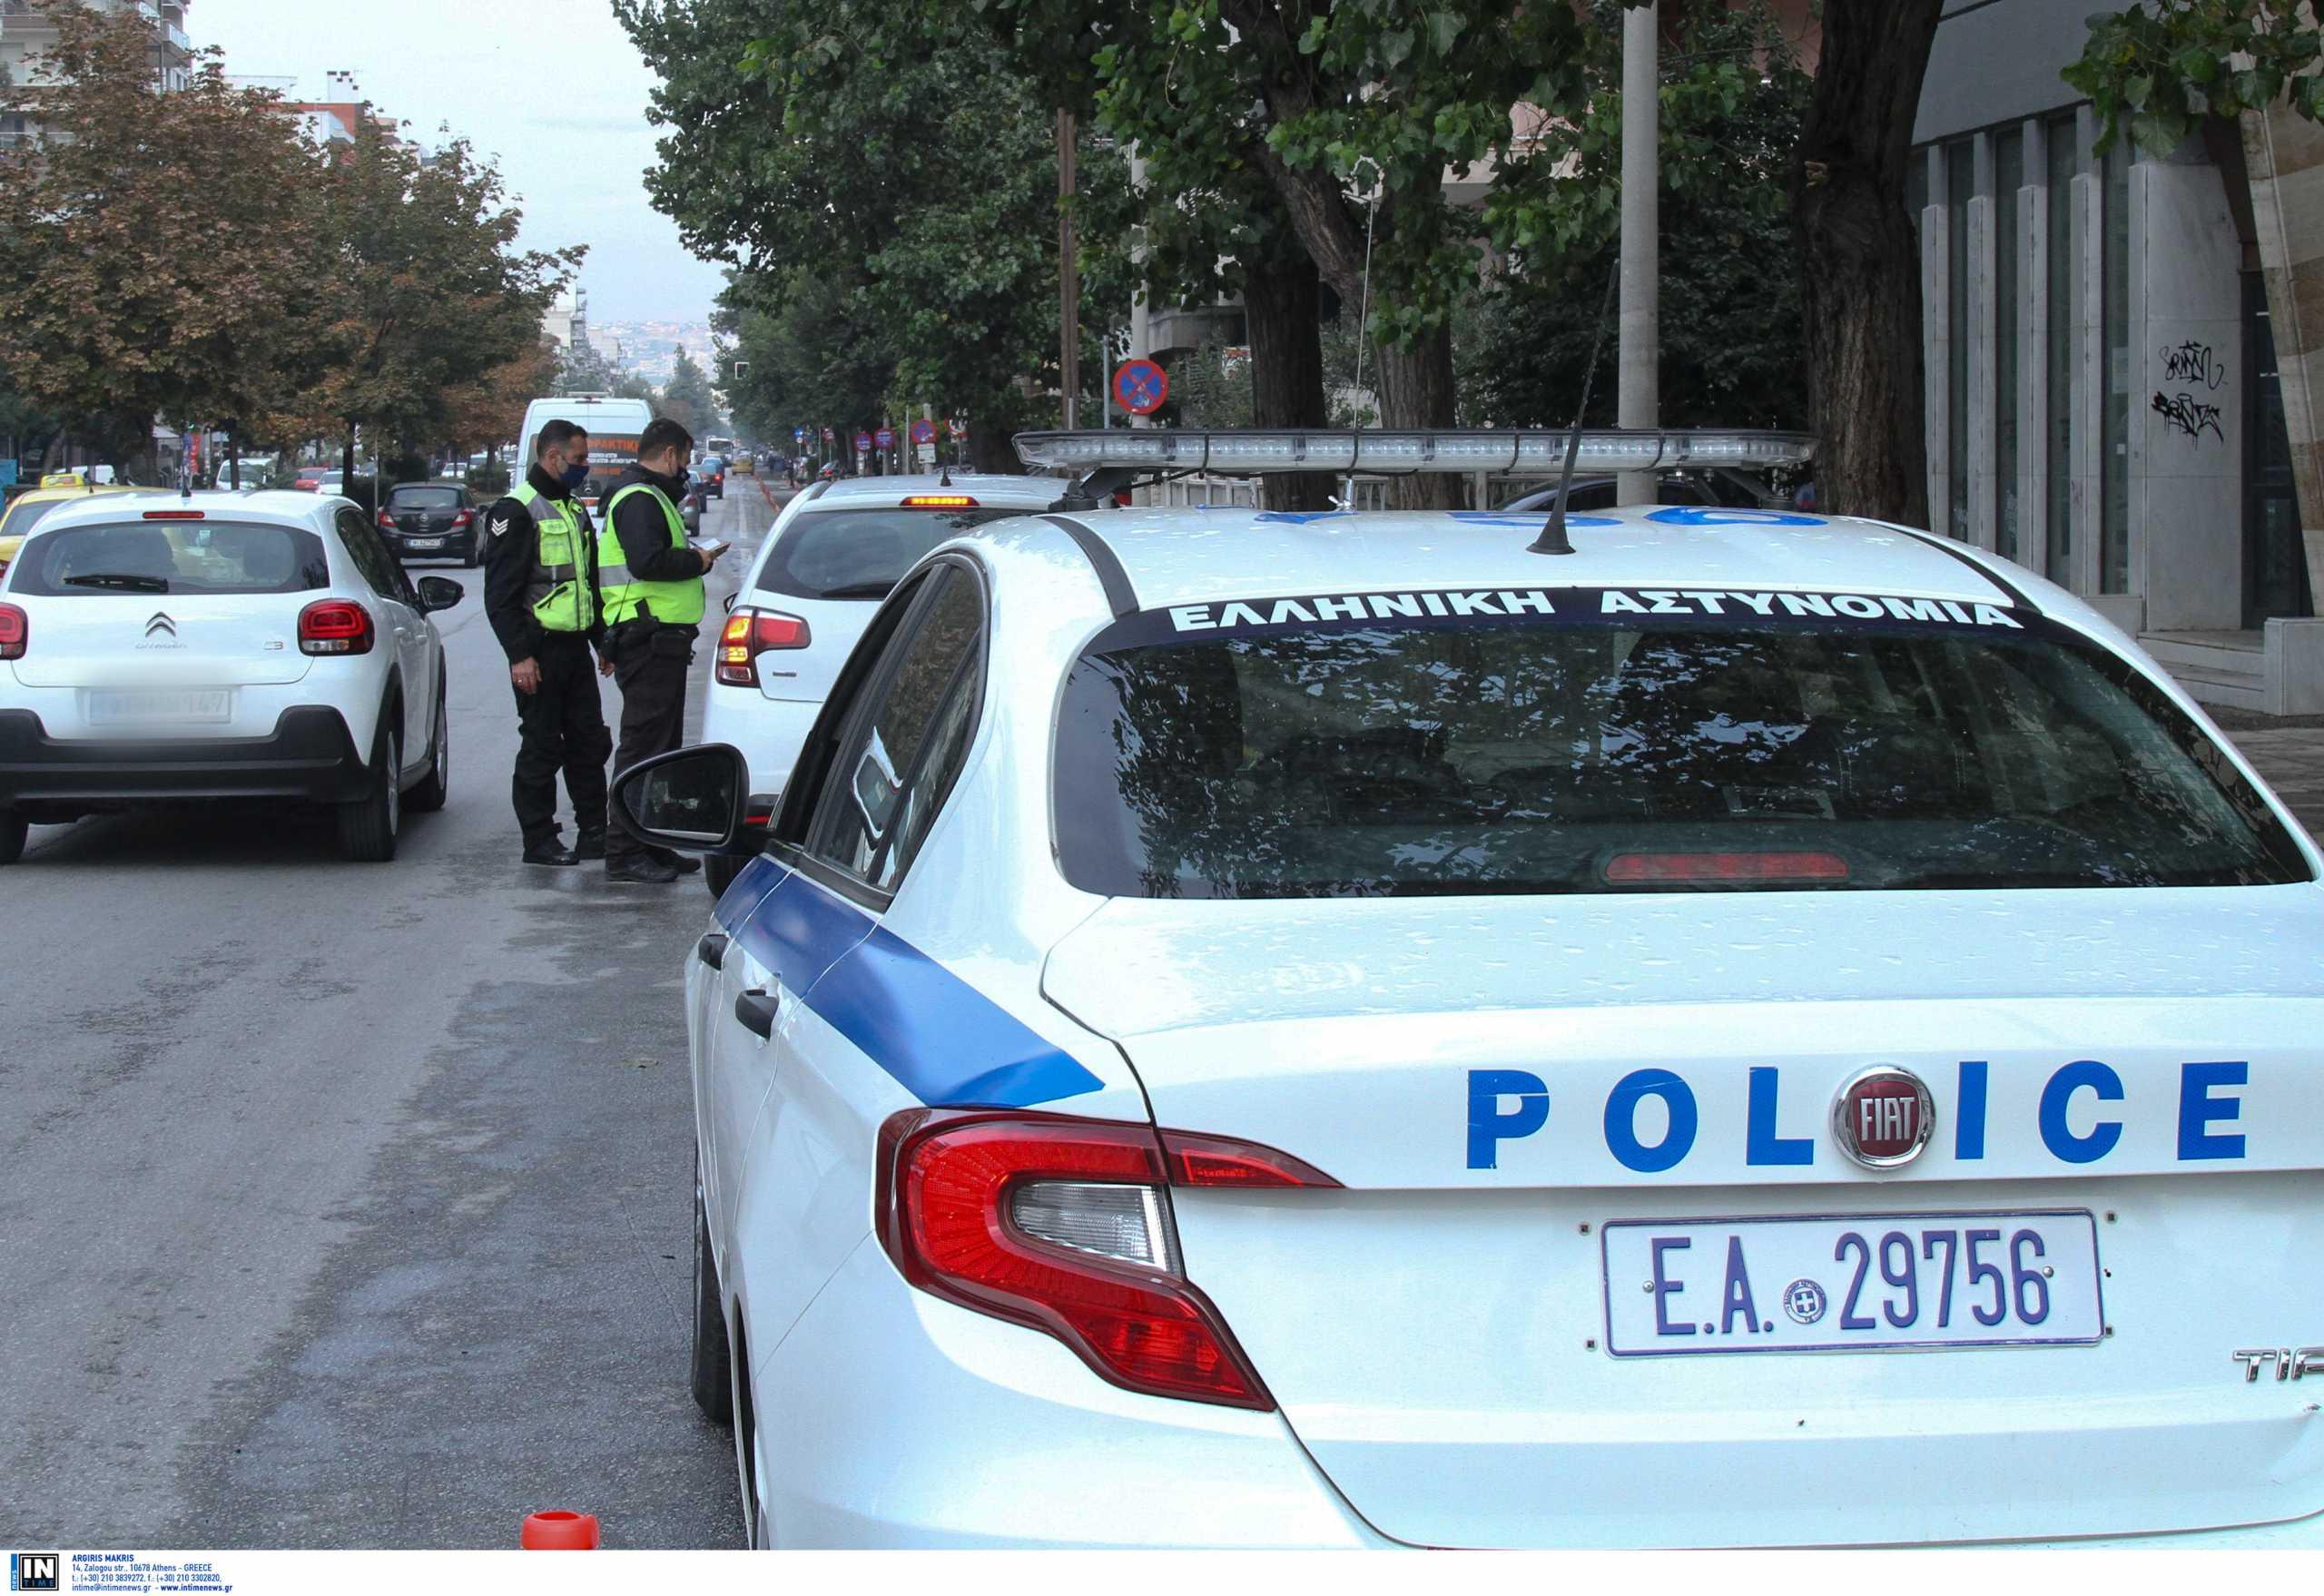 Lockdown: 312.000 ευρώ πρόστιμα σε 24 ώρες – Χειροπέδες για κορονοπάρτι